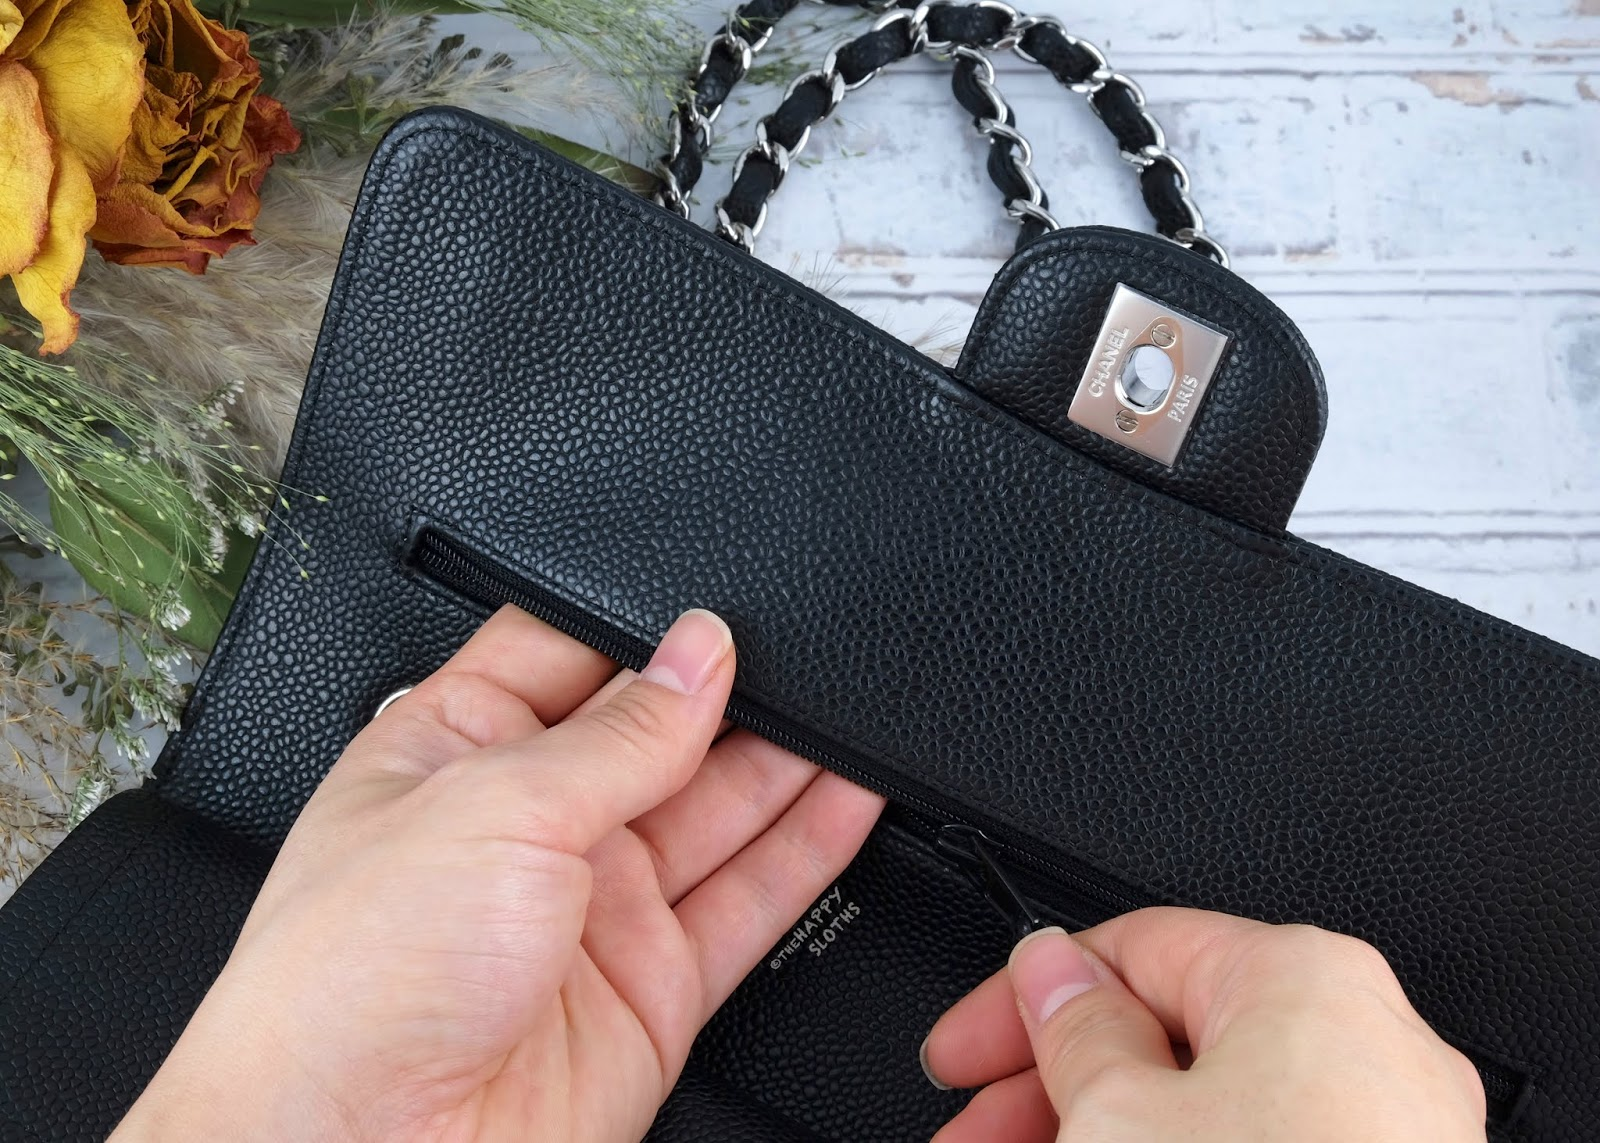 Chanel | Medium Classic Flap Handbag in Black Caviar Leather with Silver Hardware | Hidden Zipper Pocket: Review